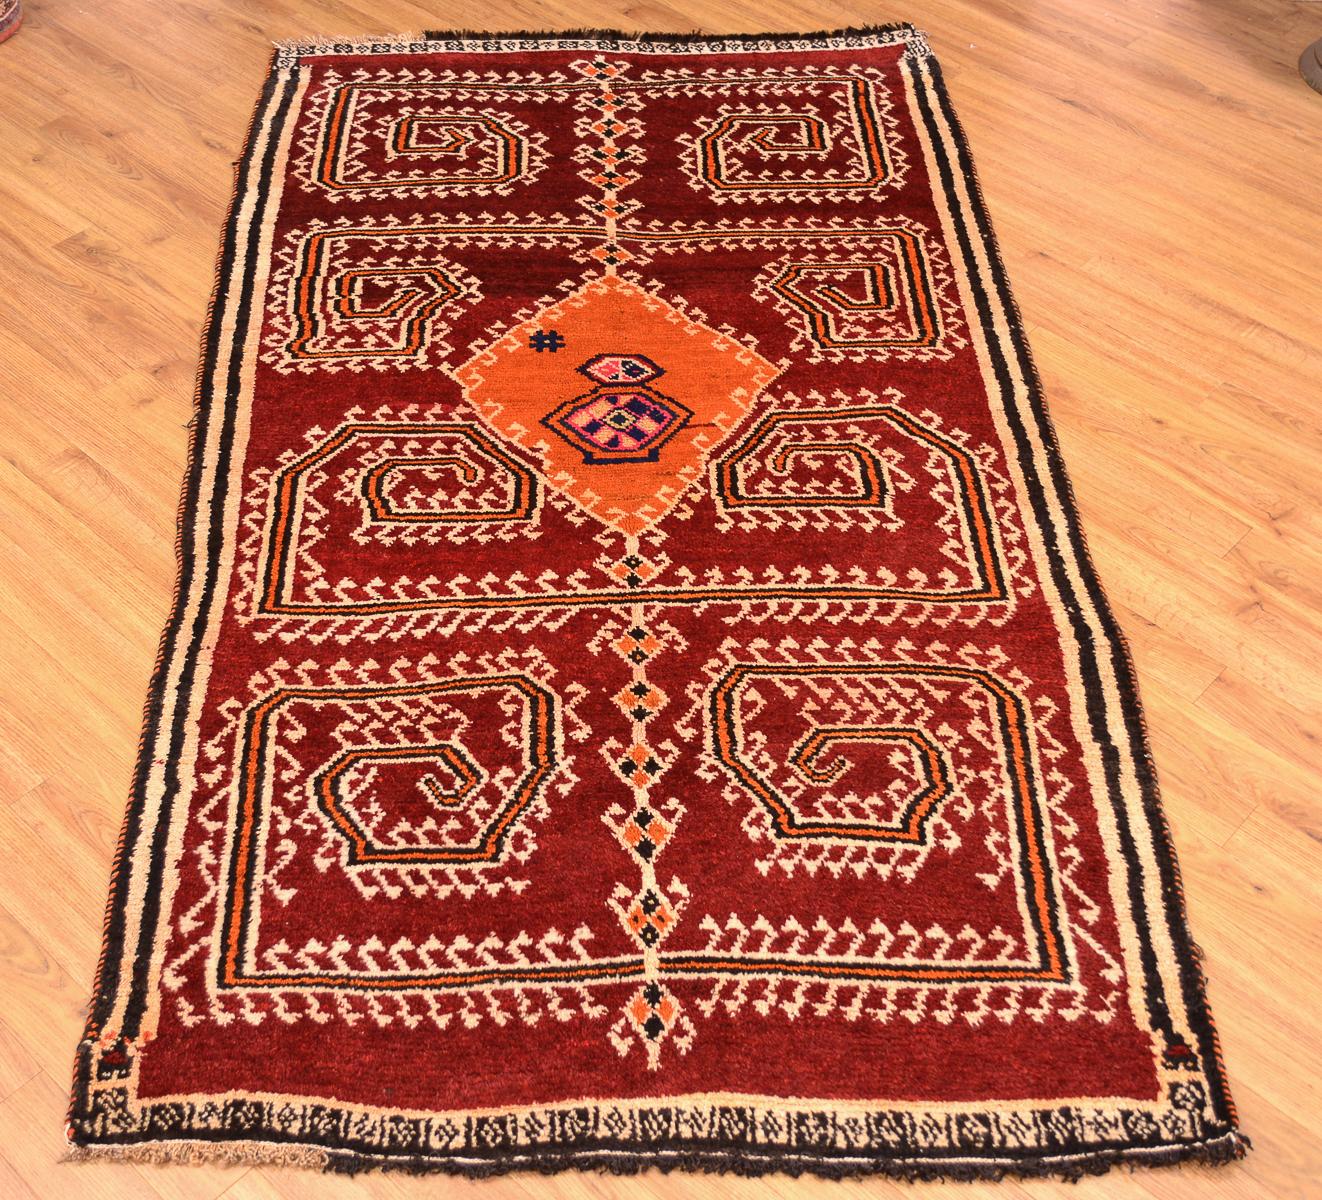 Shop Oriental Persian Gabbeh Shades Of Orange Hand Knotted: Rustic Handmade Persian Gabbeh Tribal Rug